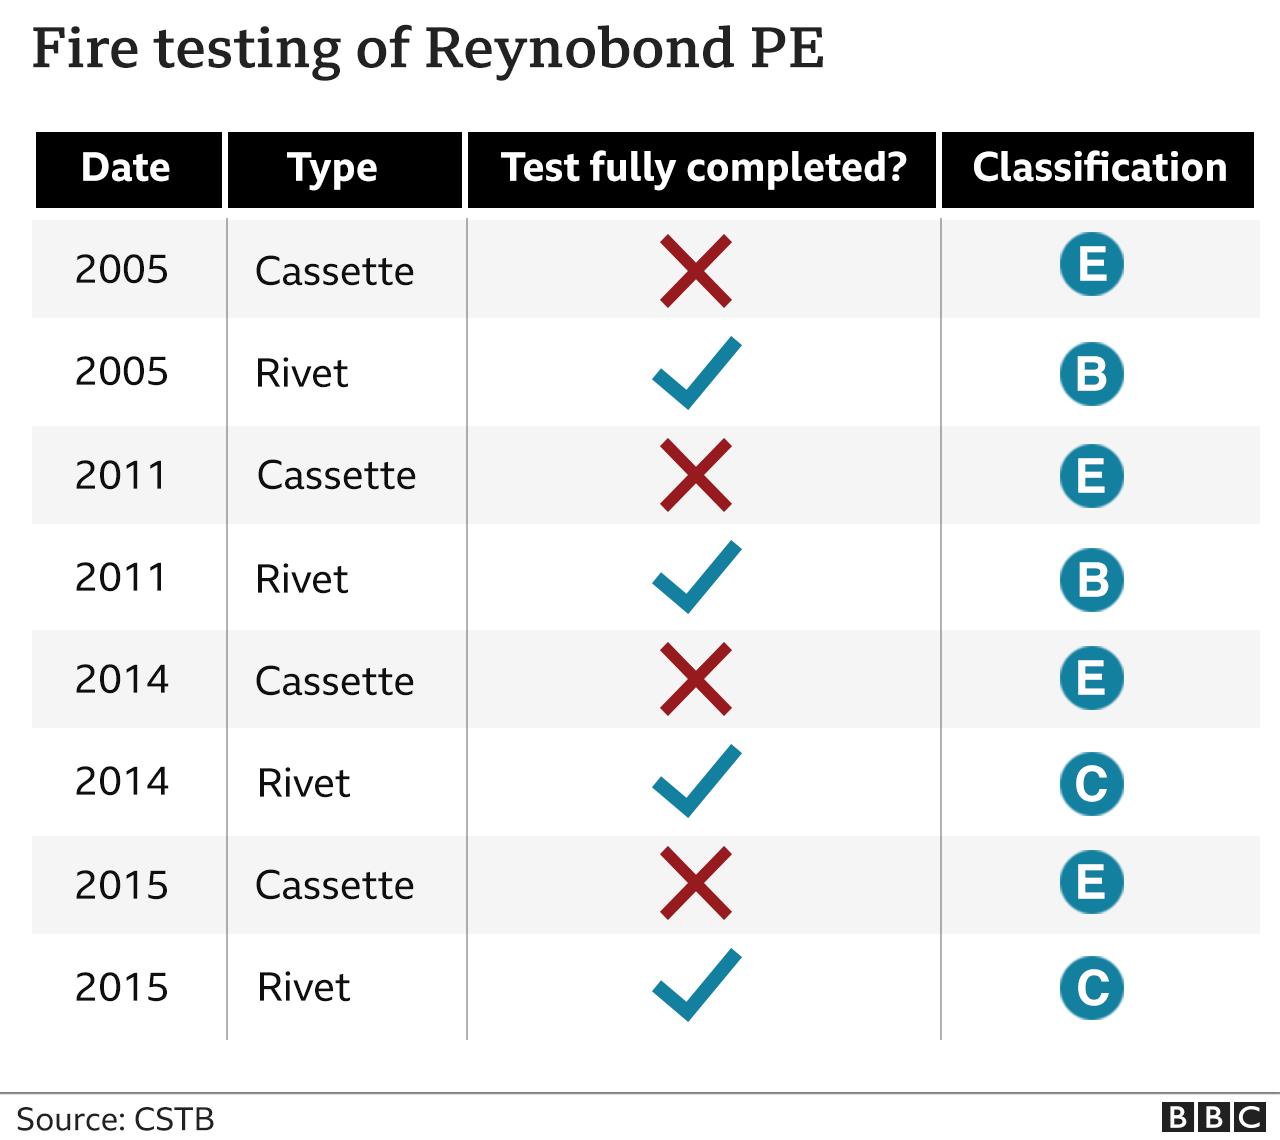 Graphic showing fire testing of Reynobond PE